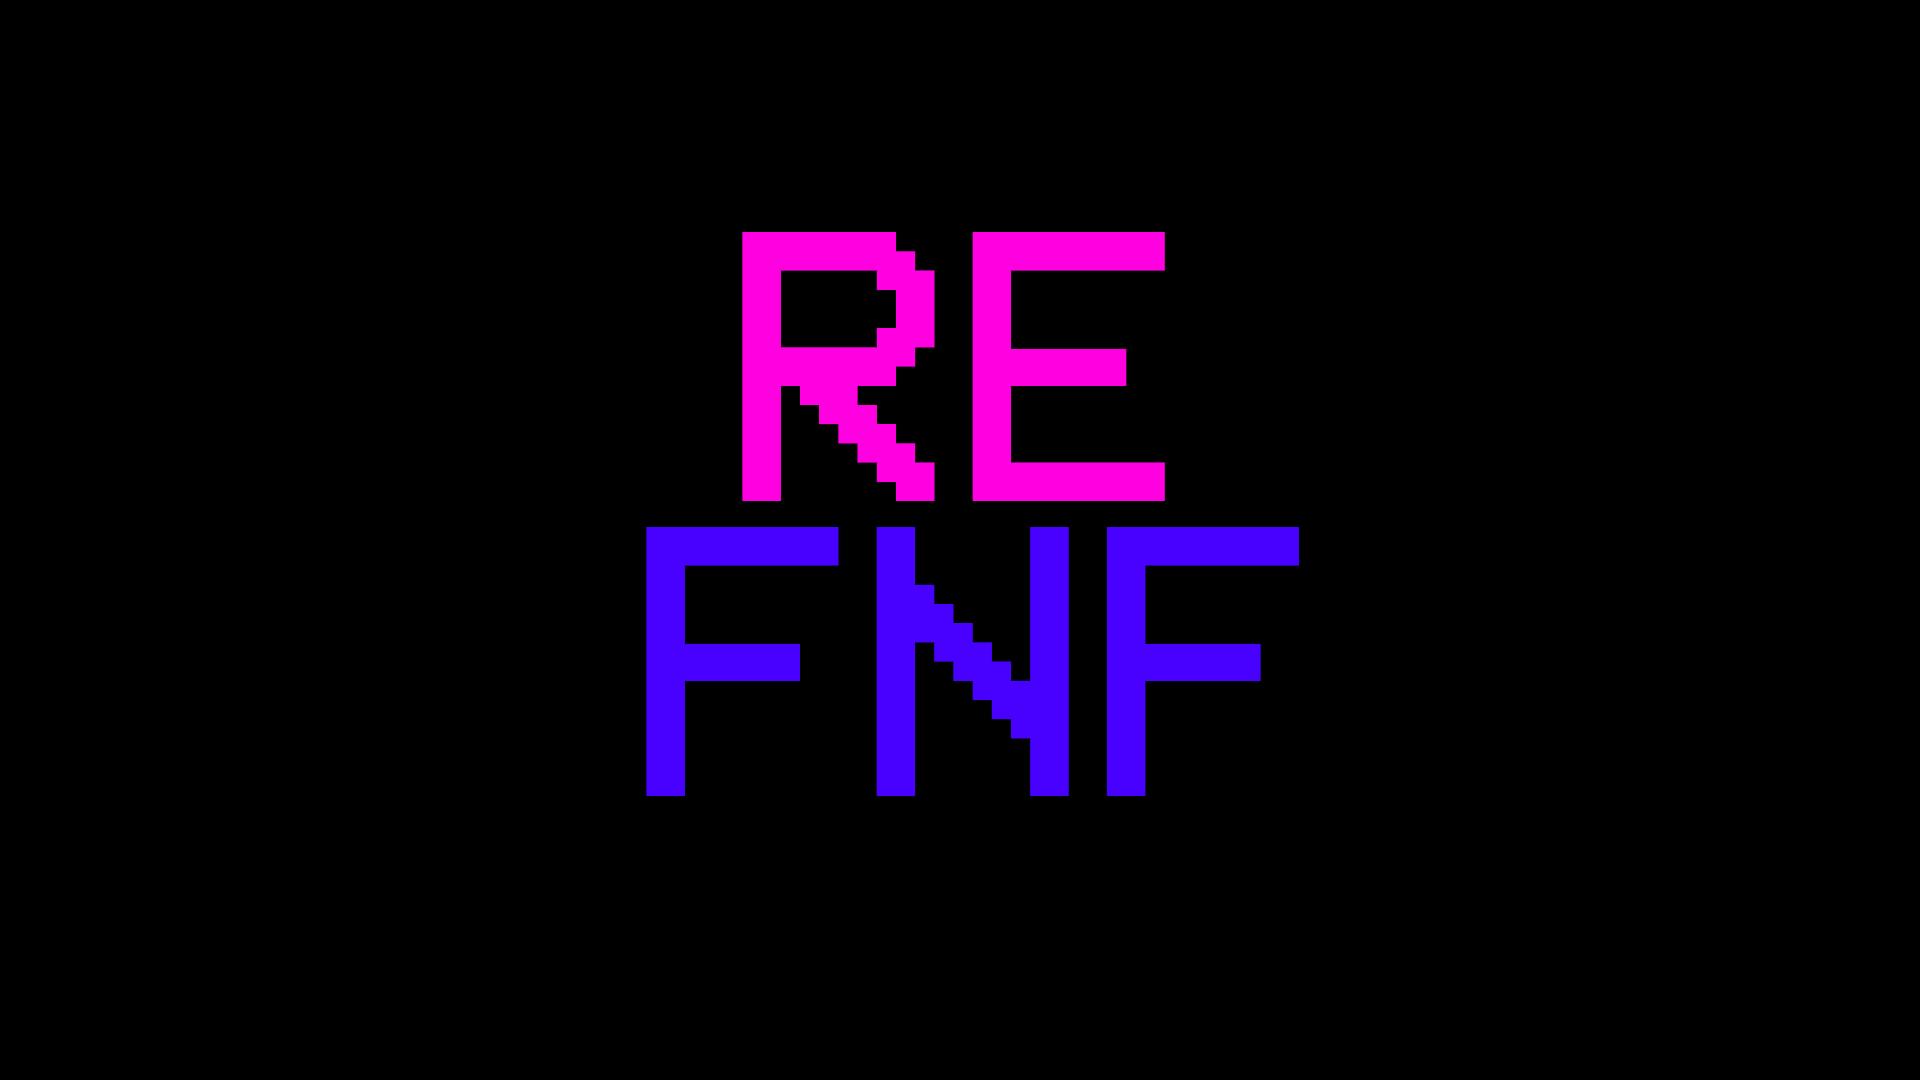 Re-FNF